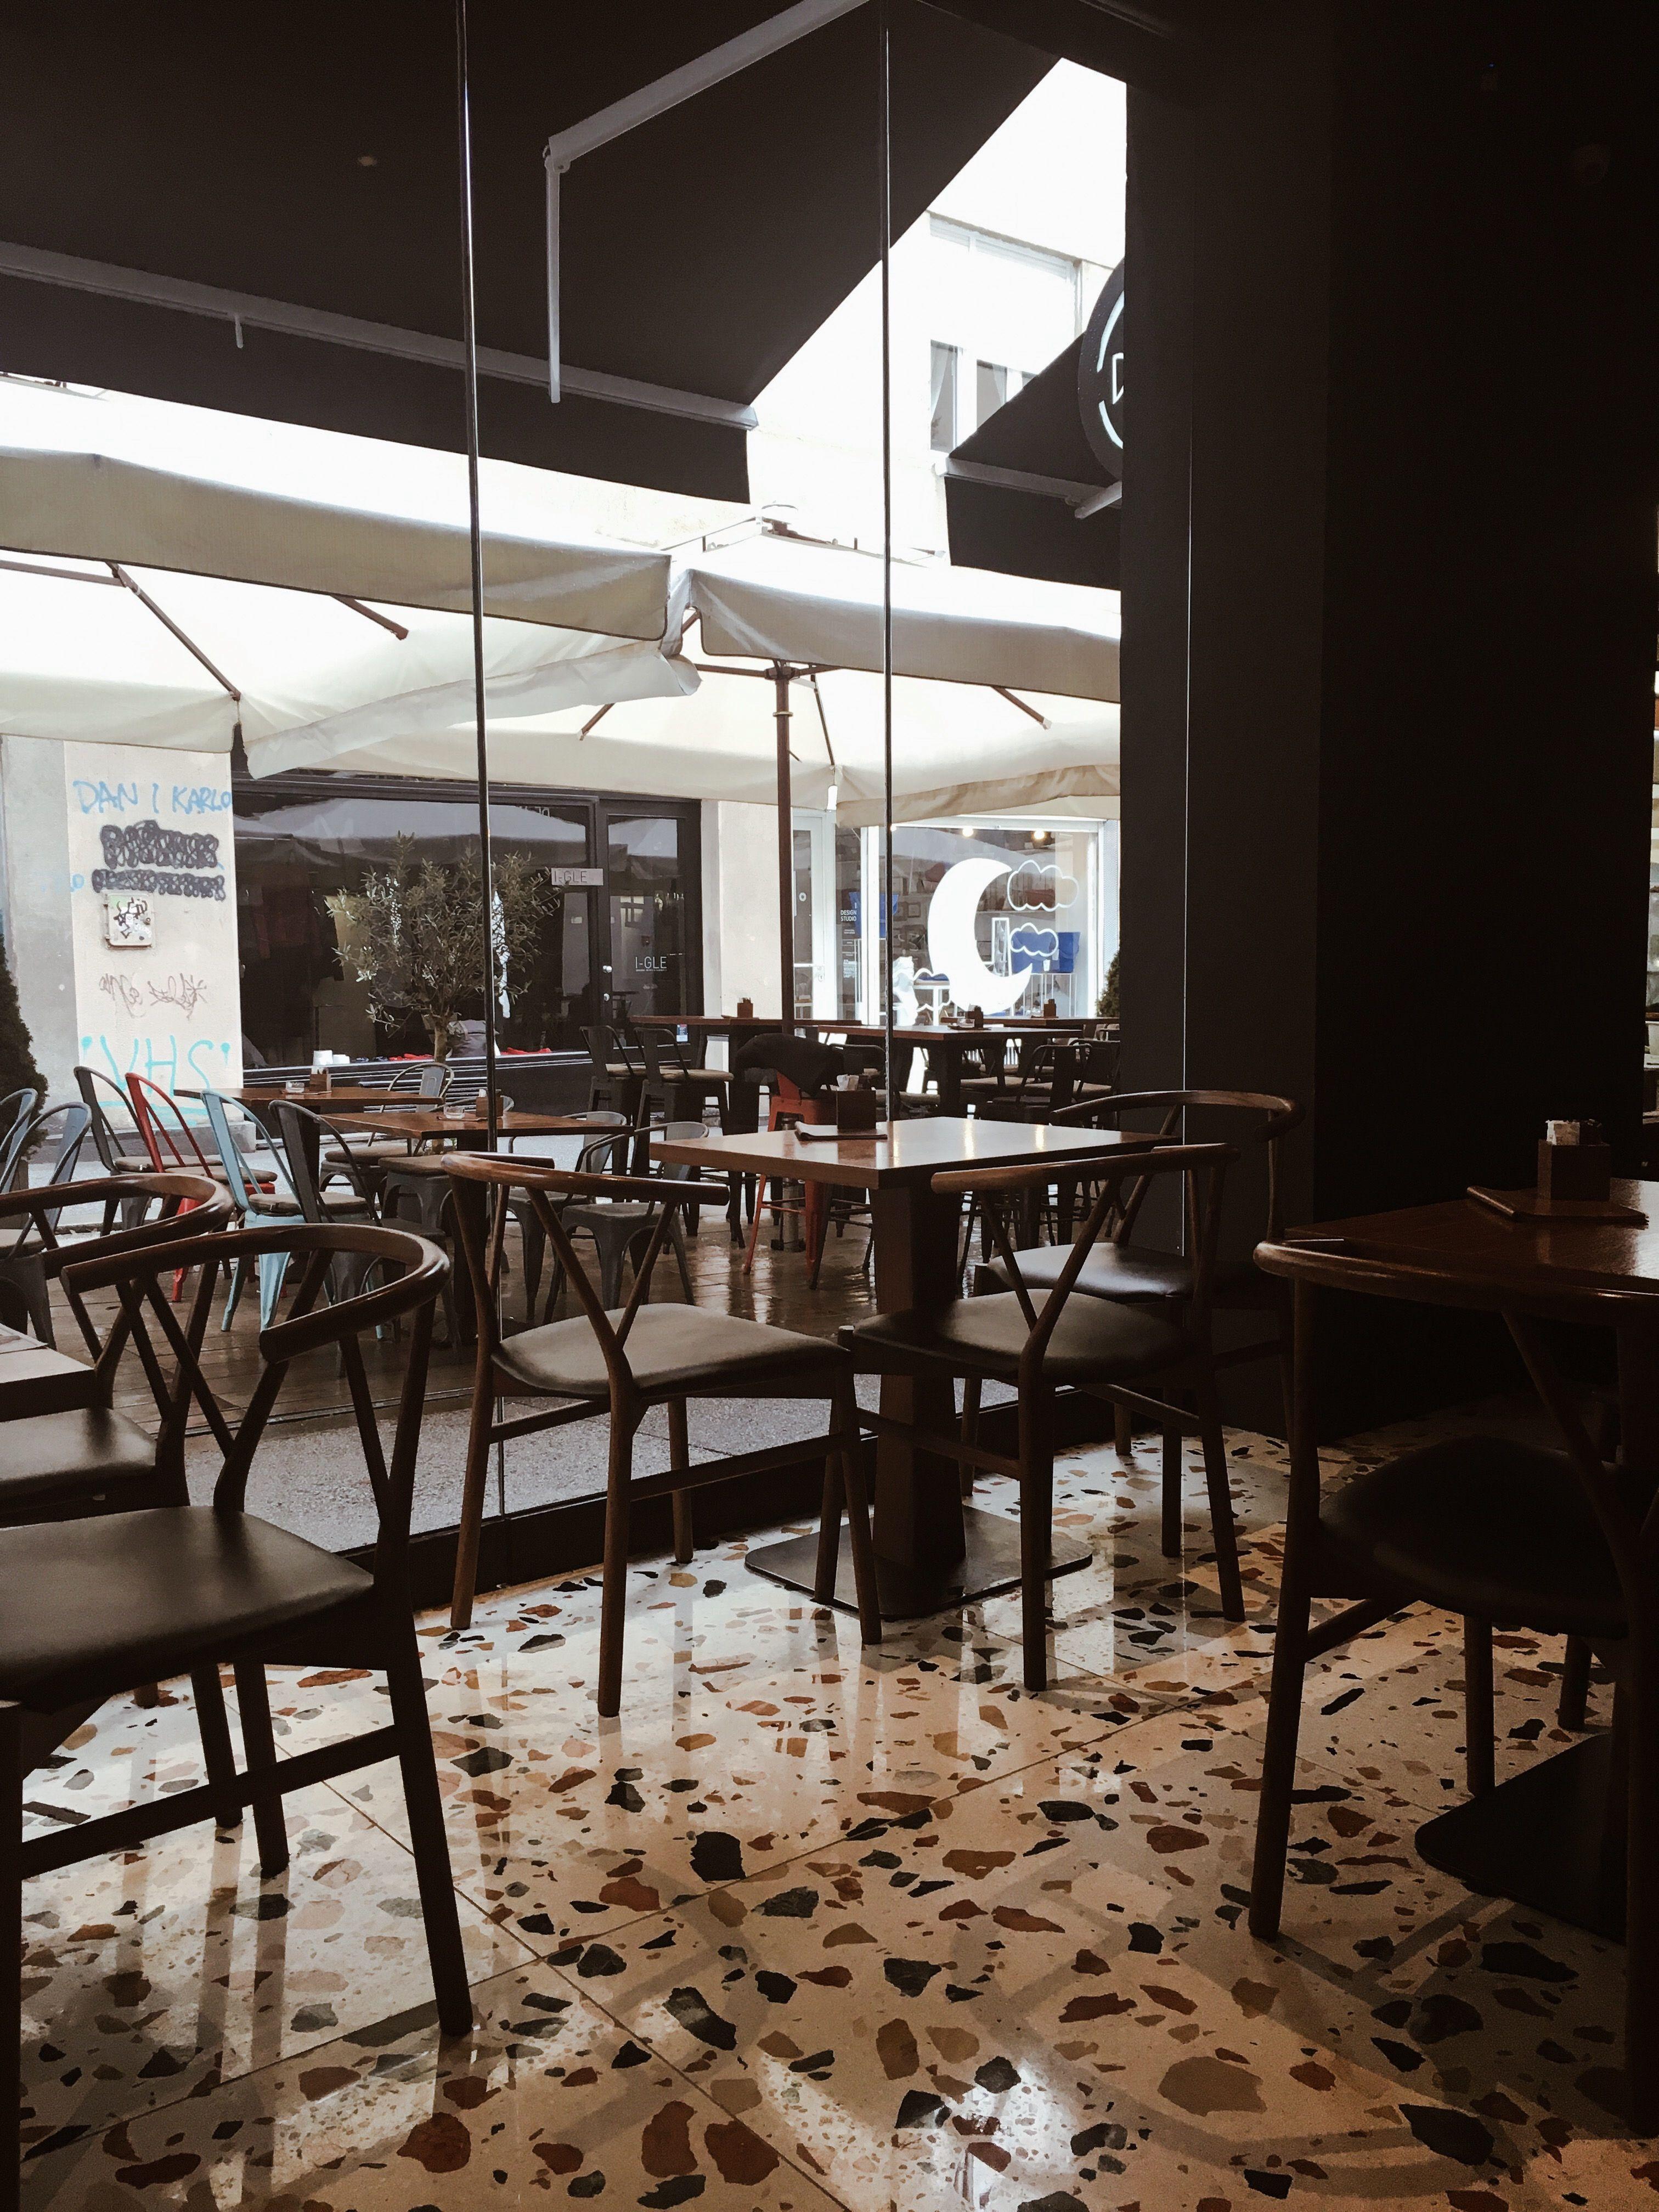 Dezman Bar Zagreb Coffeeplace Coffeebar Zagreb Coffee Places Dining Table Coffee Bar